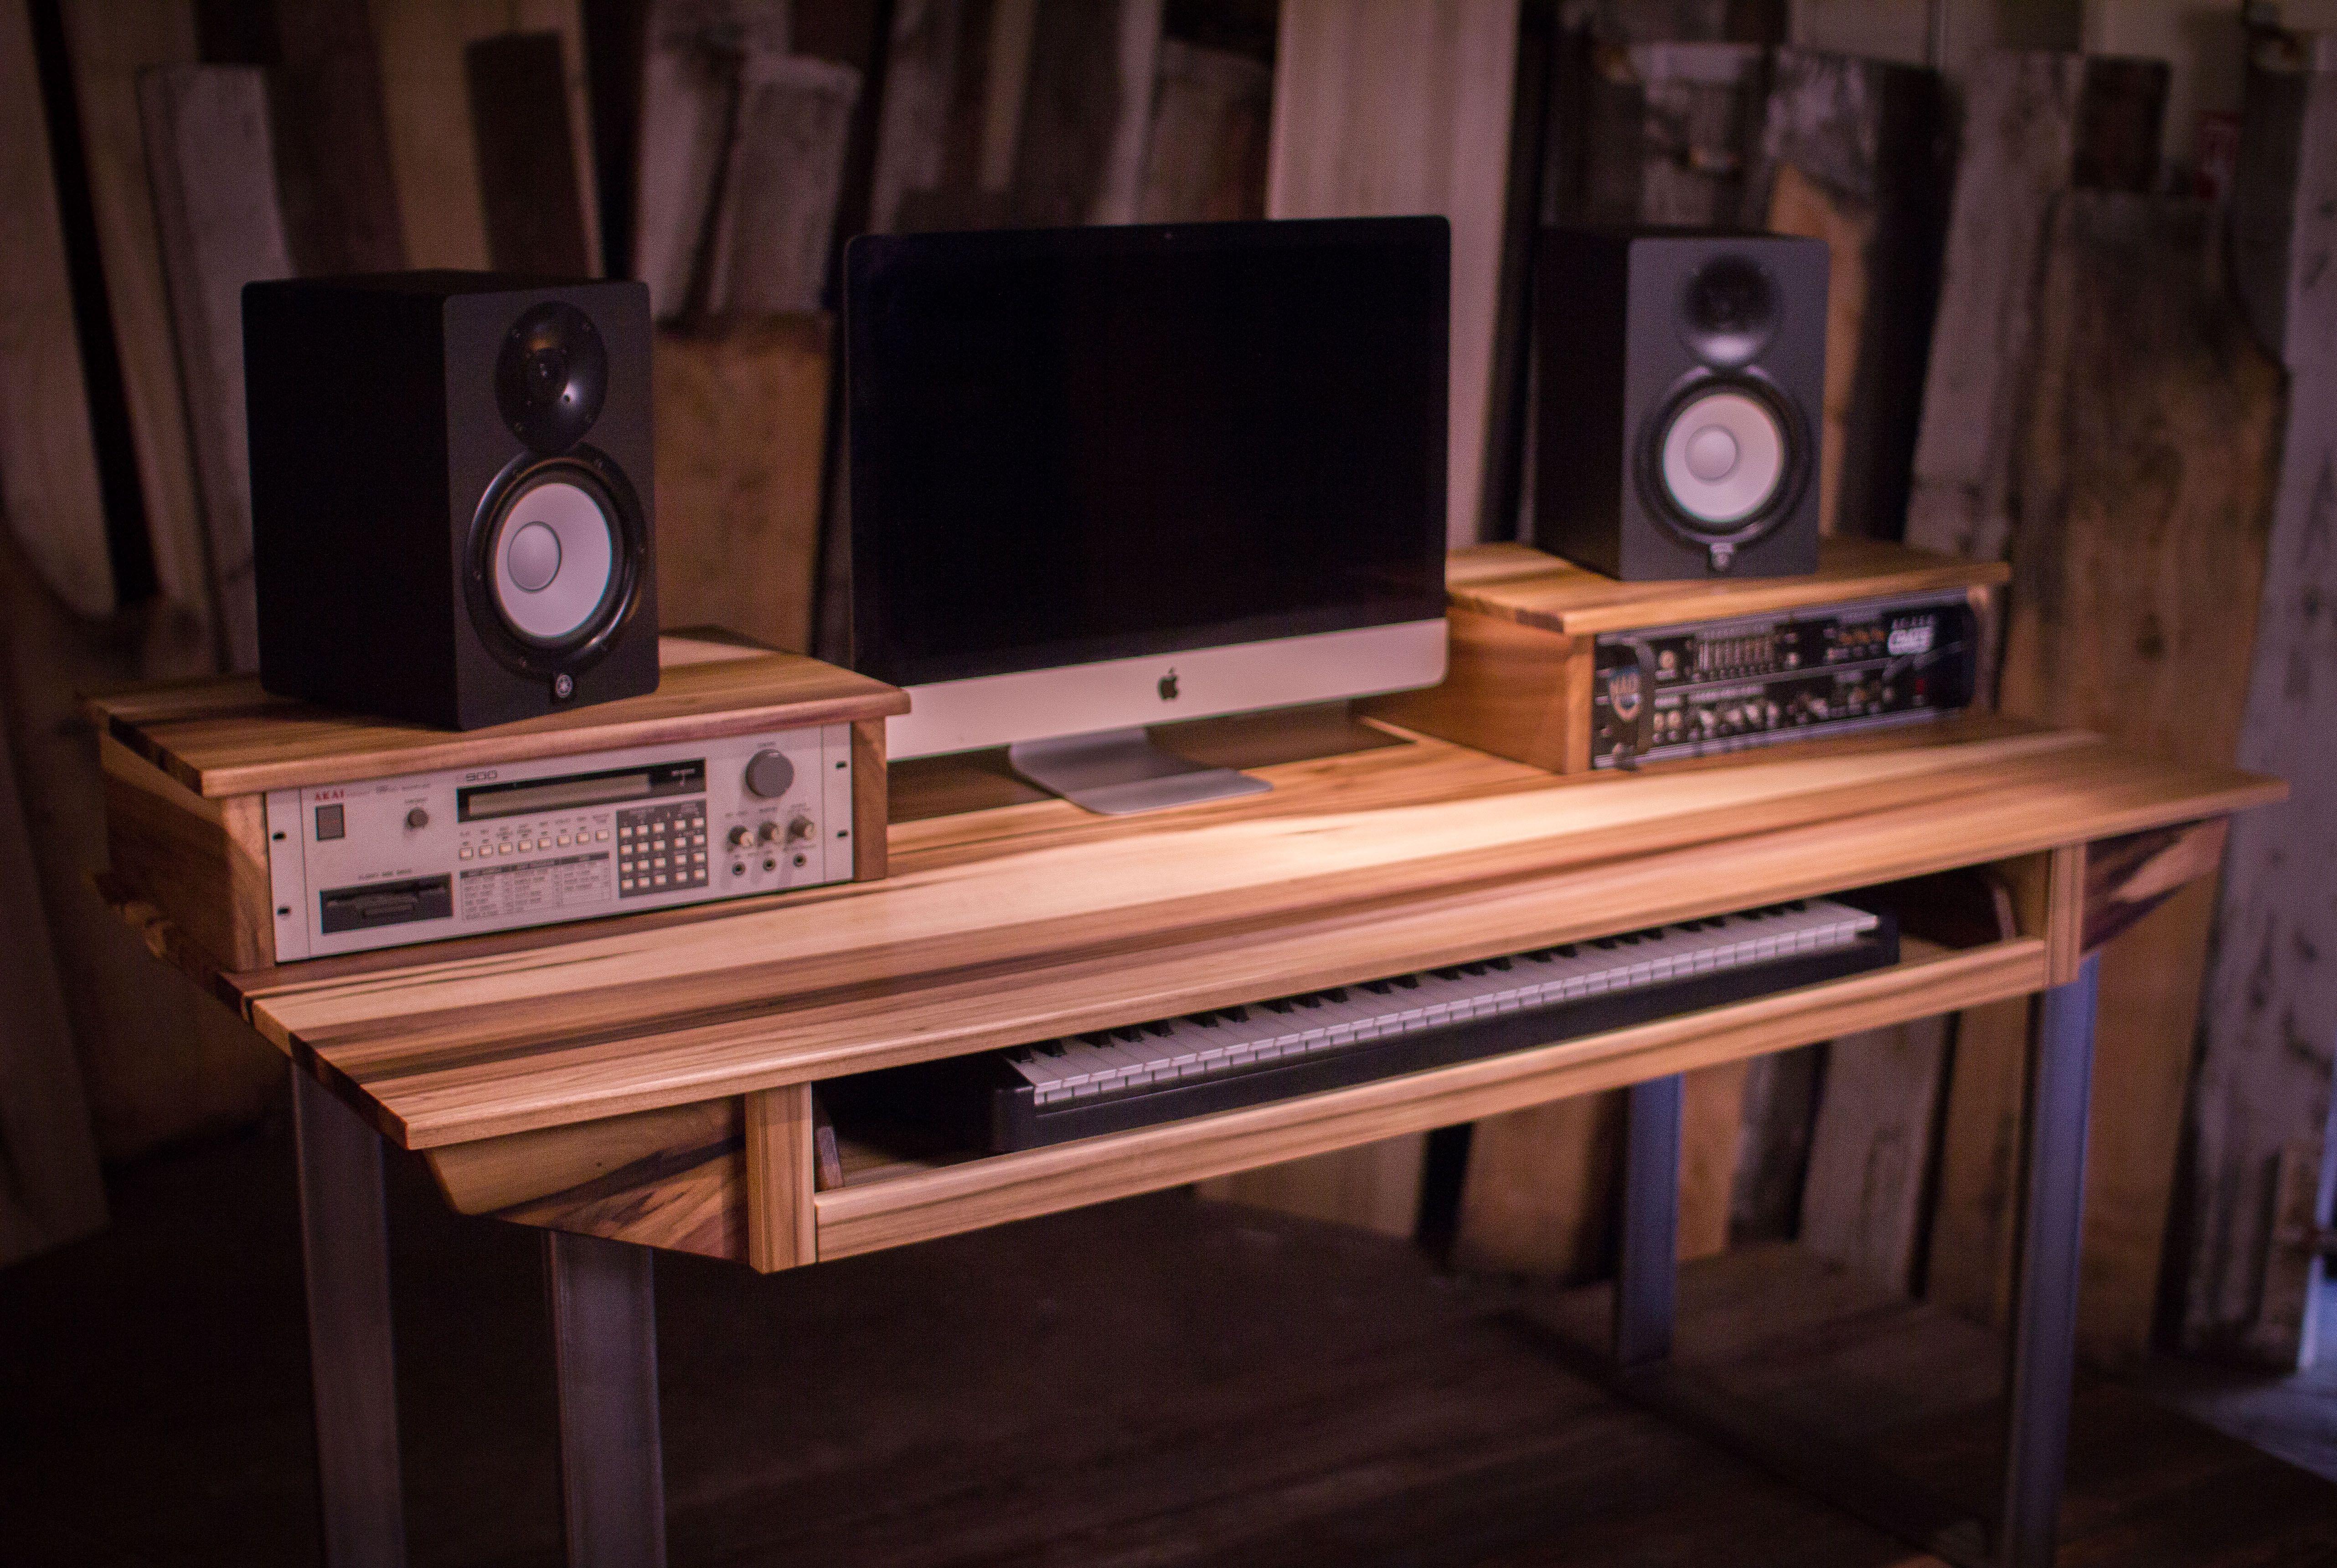 Custom Made Studio Desk For Audio + Video Production W/ Keyboard  Workstation Shelf And Rack